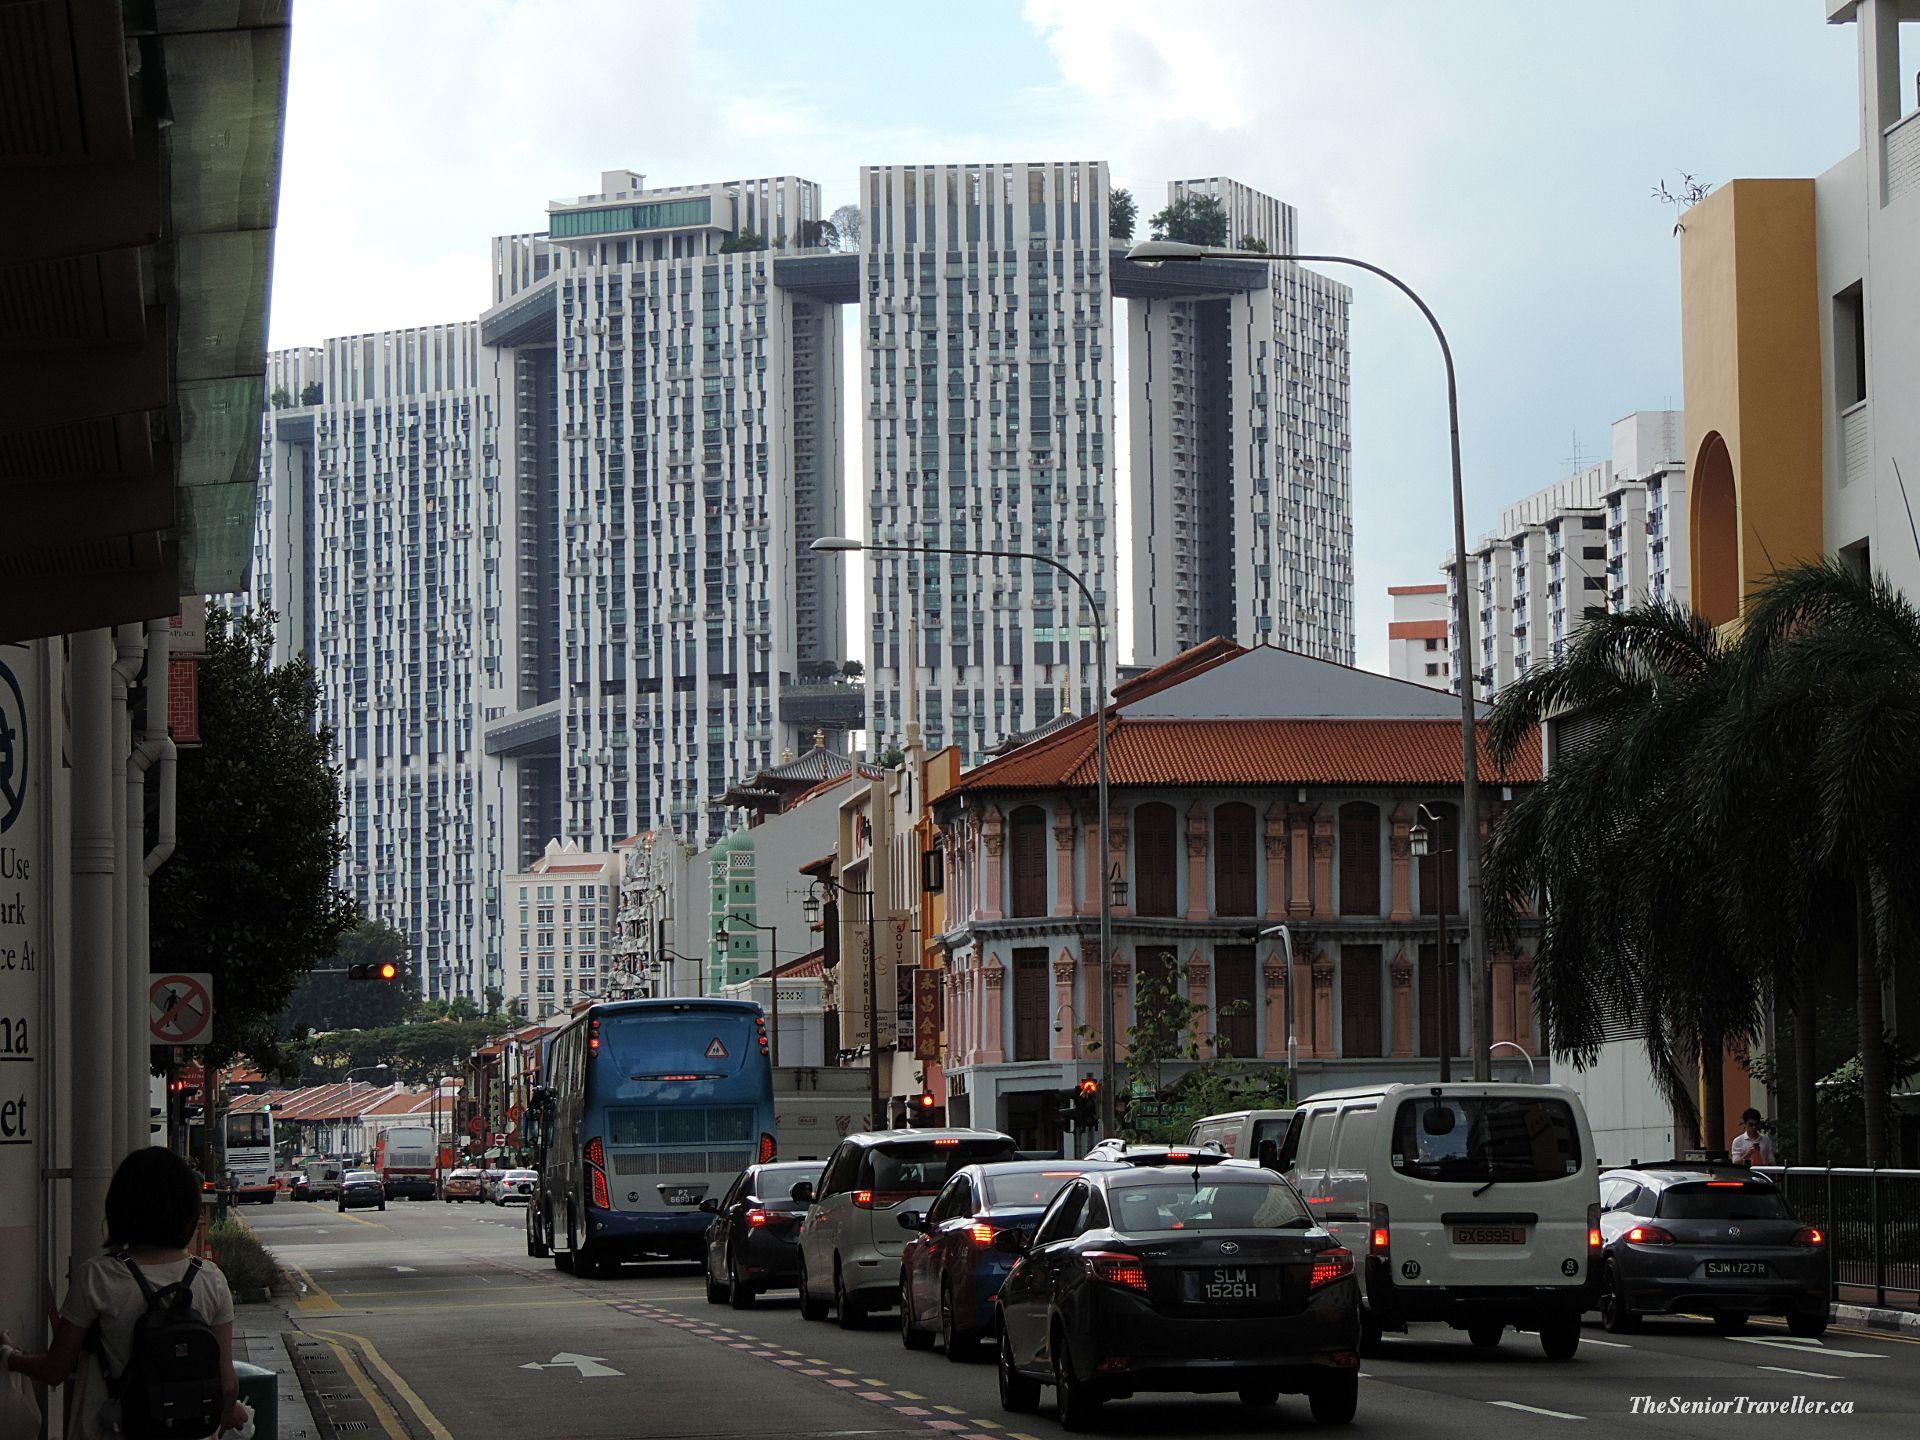 Sightsee around the city